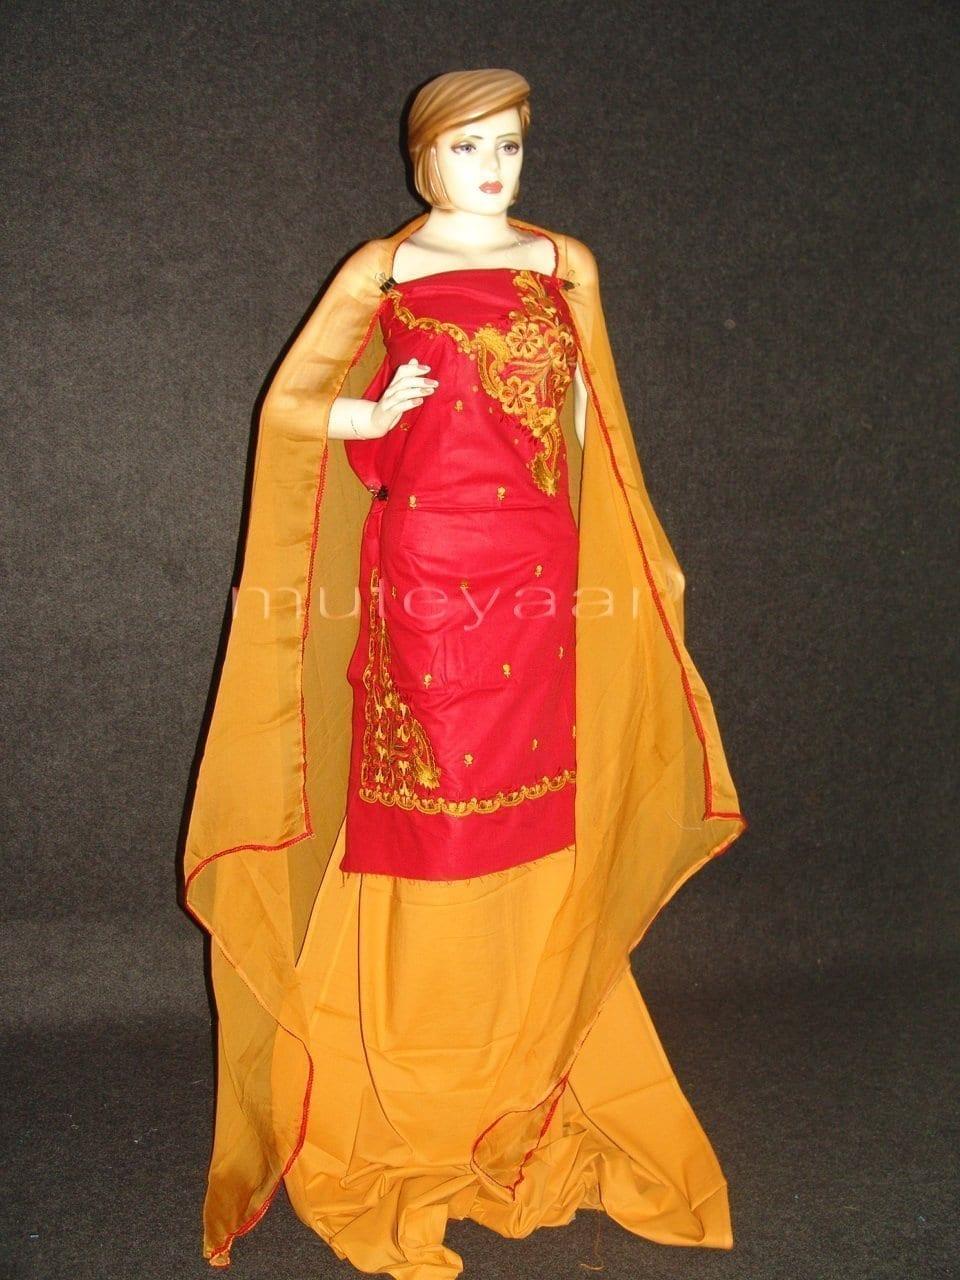 FULL PATIALA 100% cotton Salwar Suit PURE CHIFFON Dupatta RM235 1